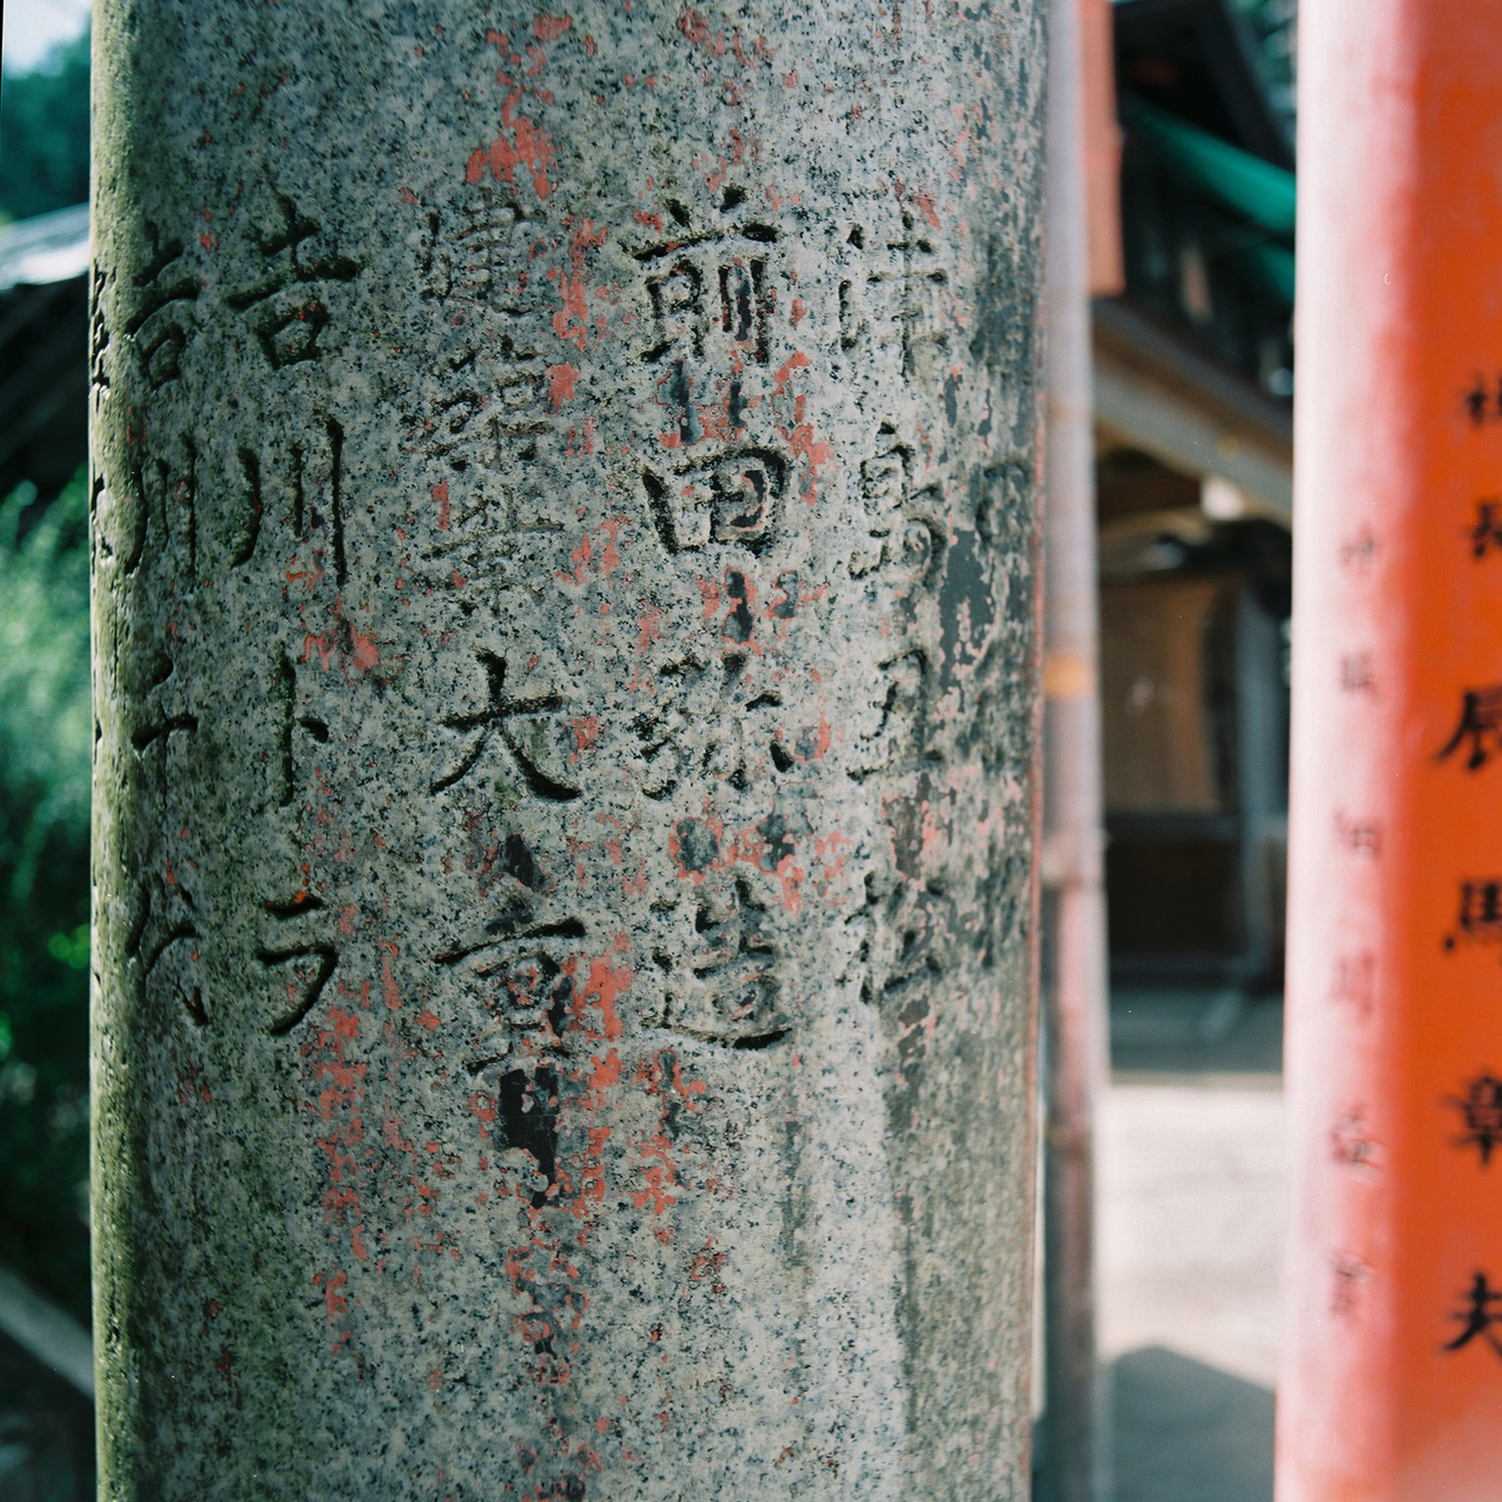 Torii, Fushimi Inari Taisha, Fushimi-ku, Kyoto, Japan, 2012